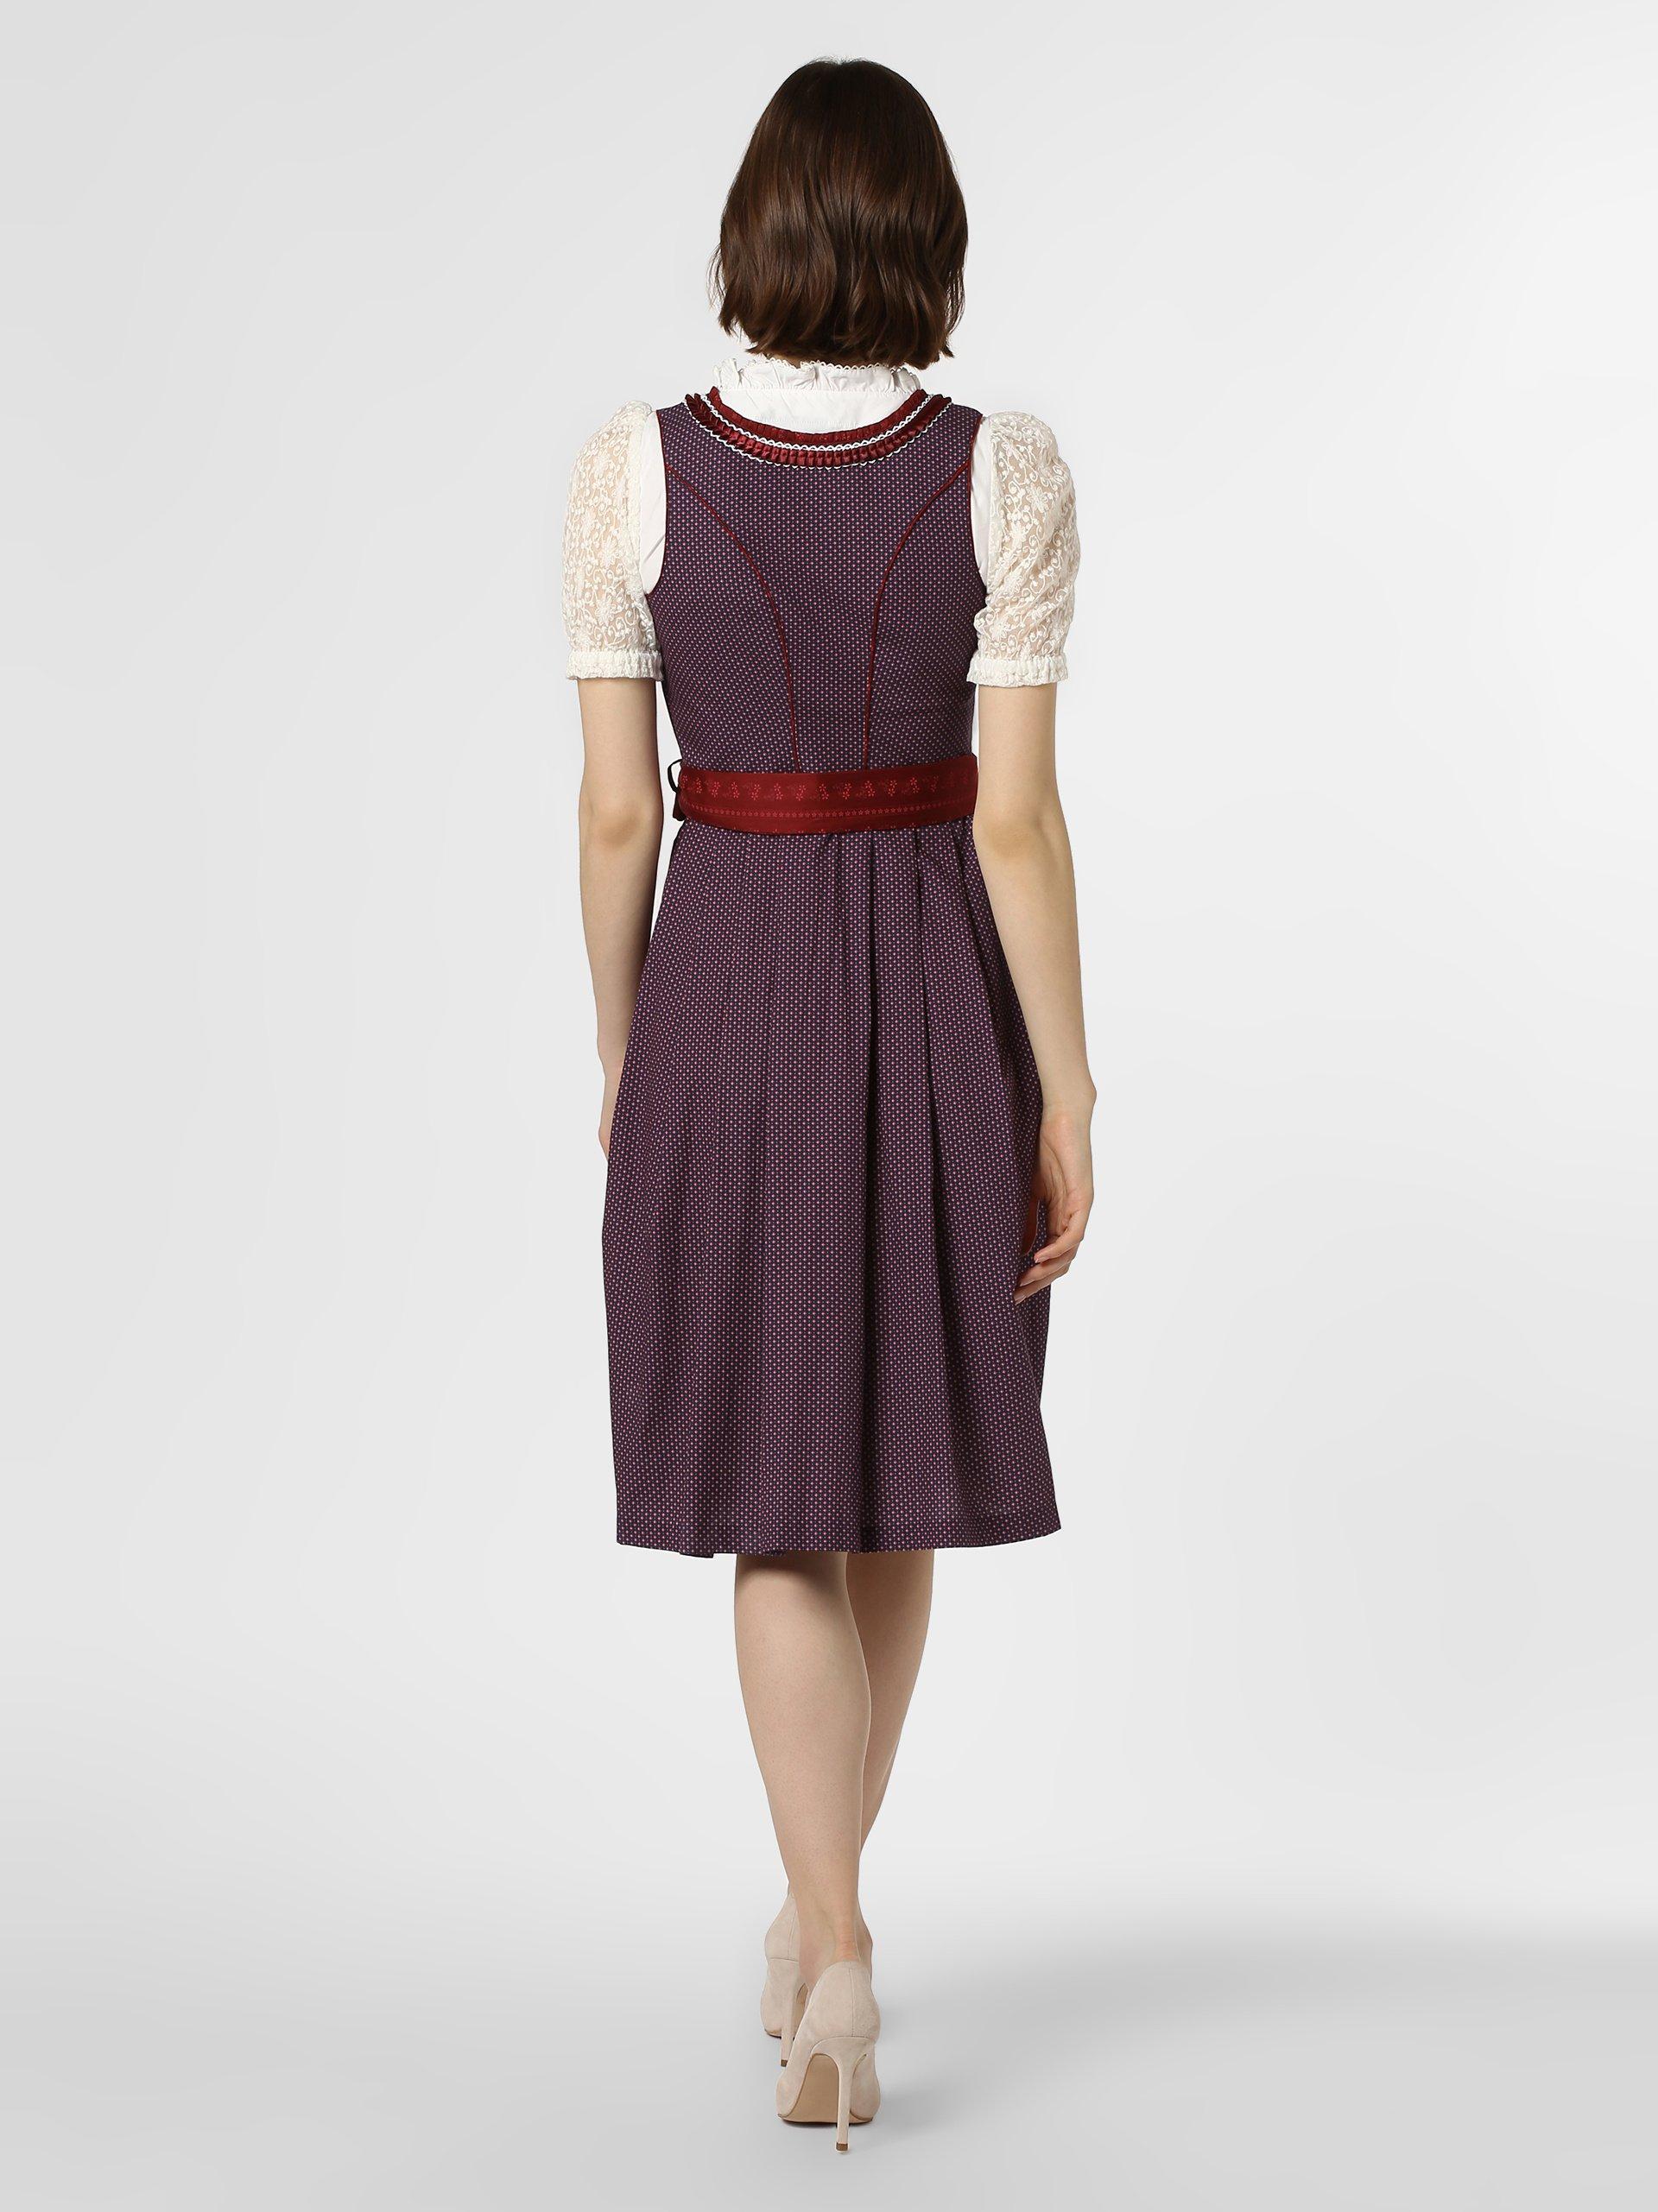 Alpenfeeling Ludowa sukienka damska